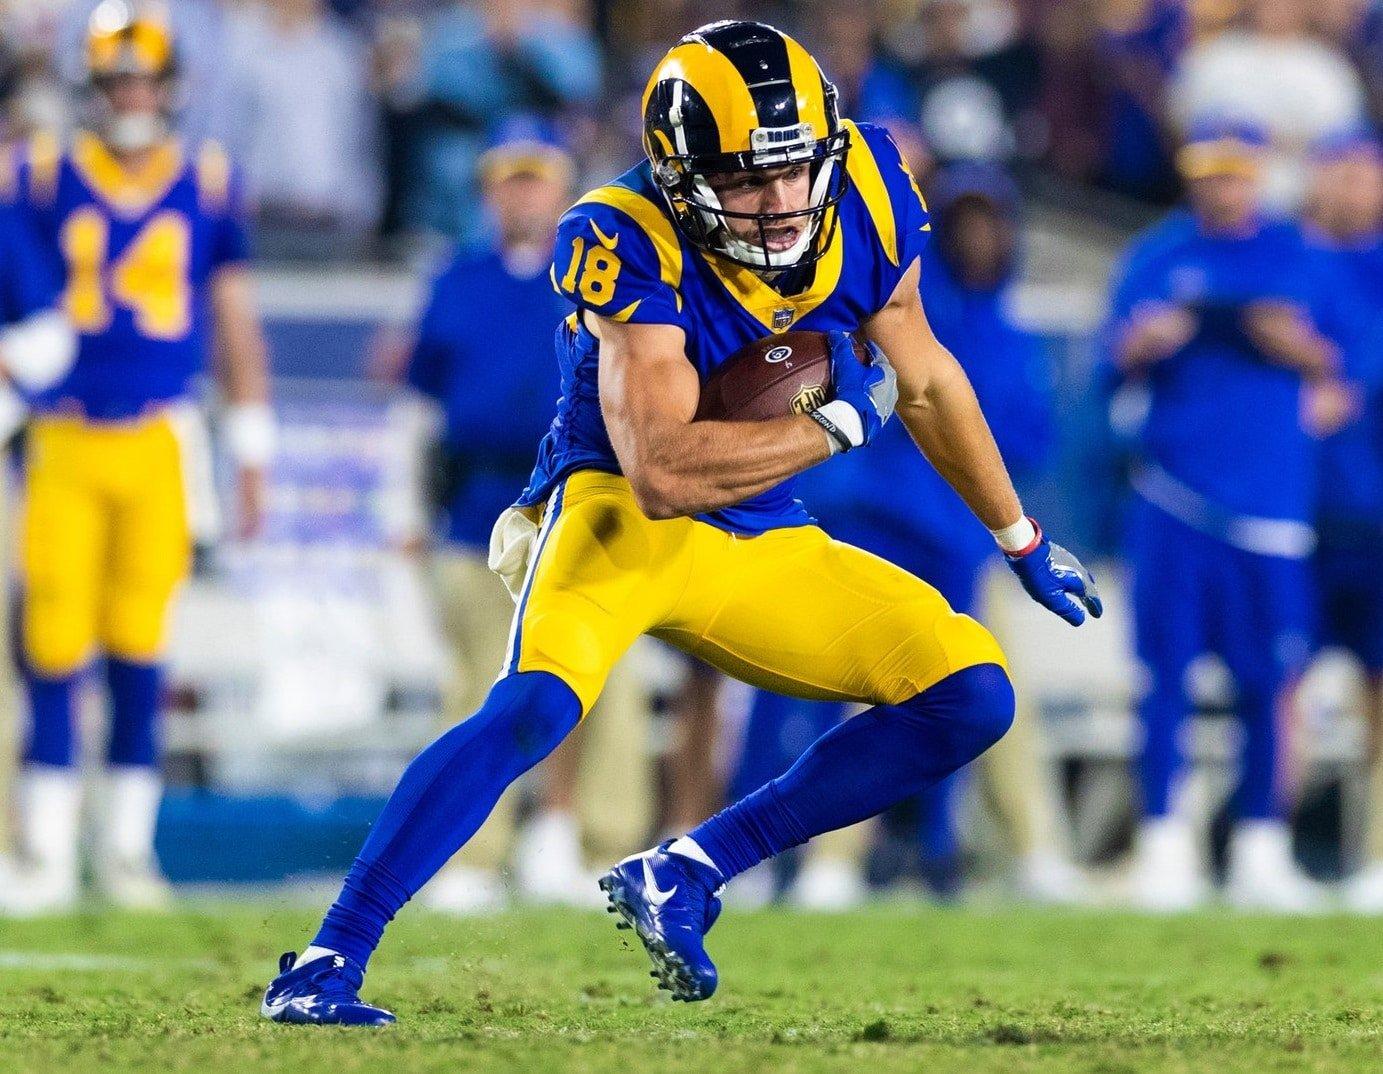 Cooper Kupp, wide receiver do Los Angeles Rams